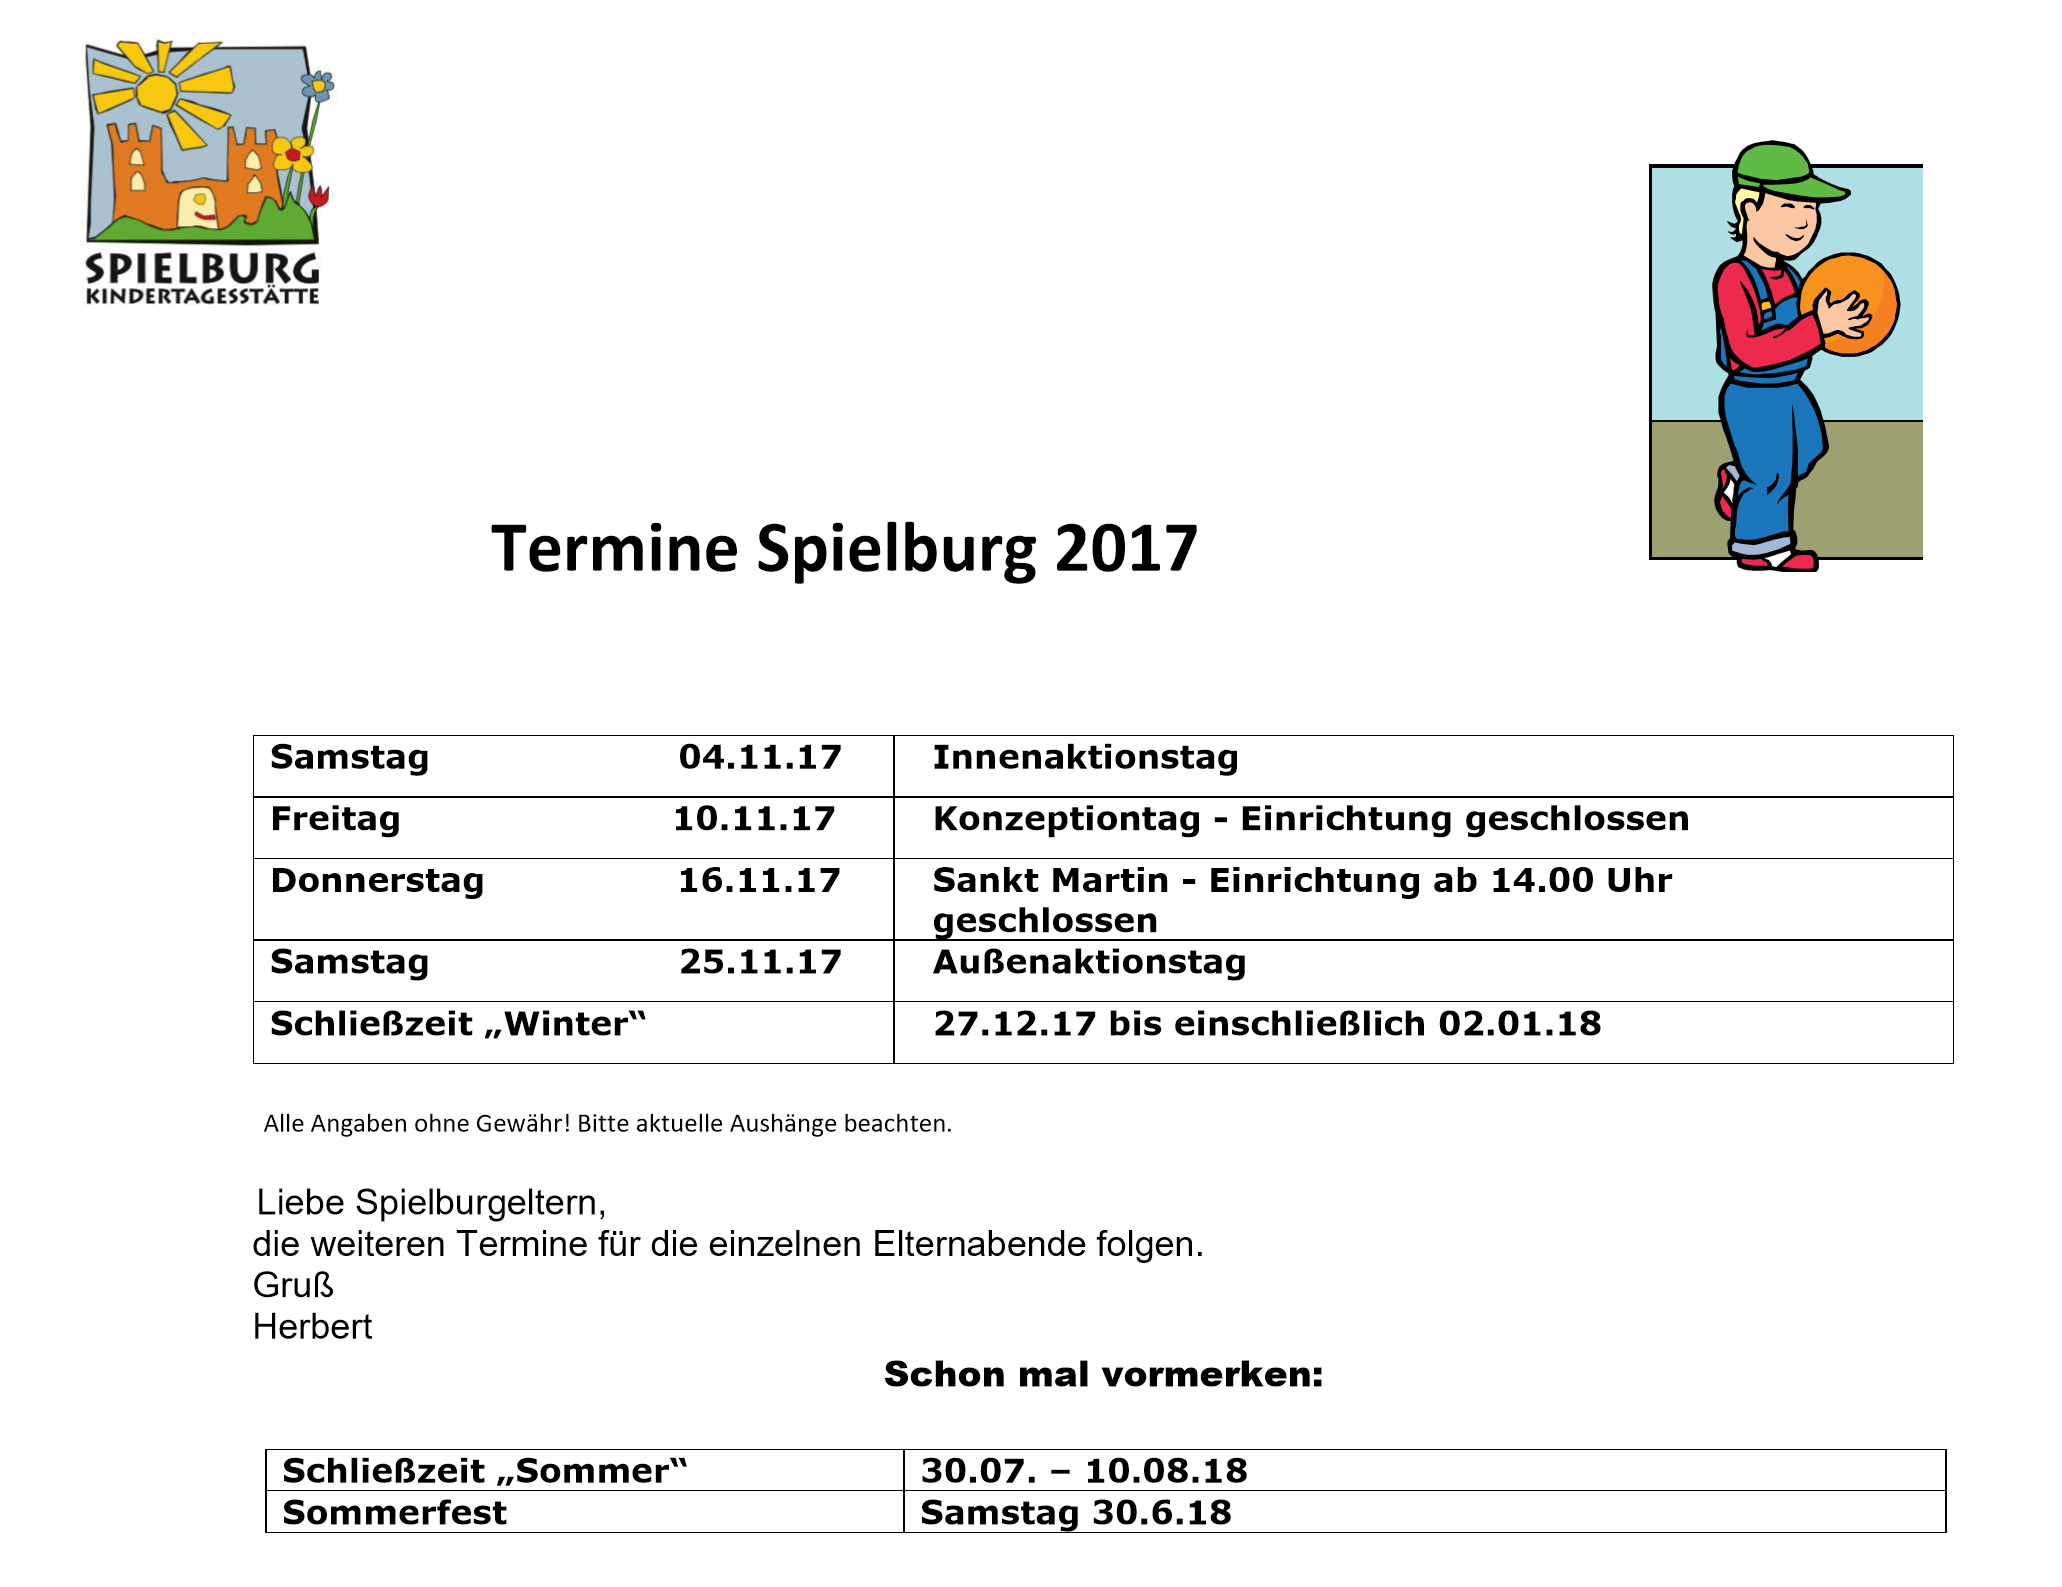 KiTa Spielburg Termine 2017-11